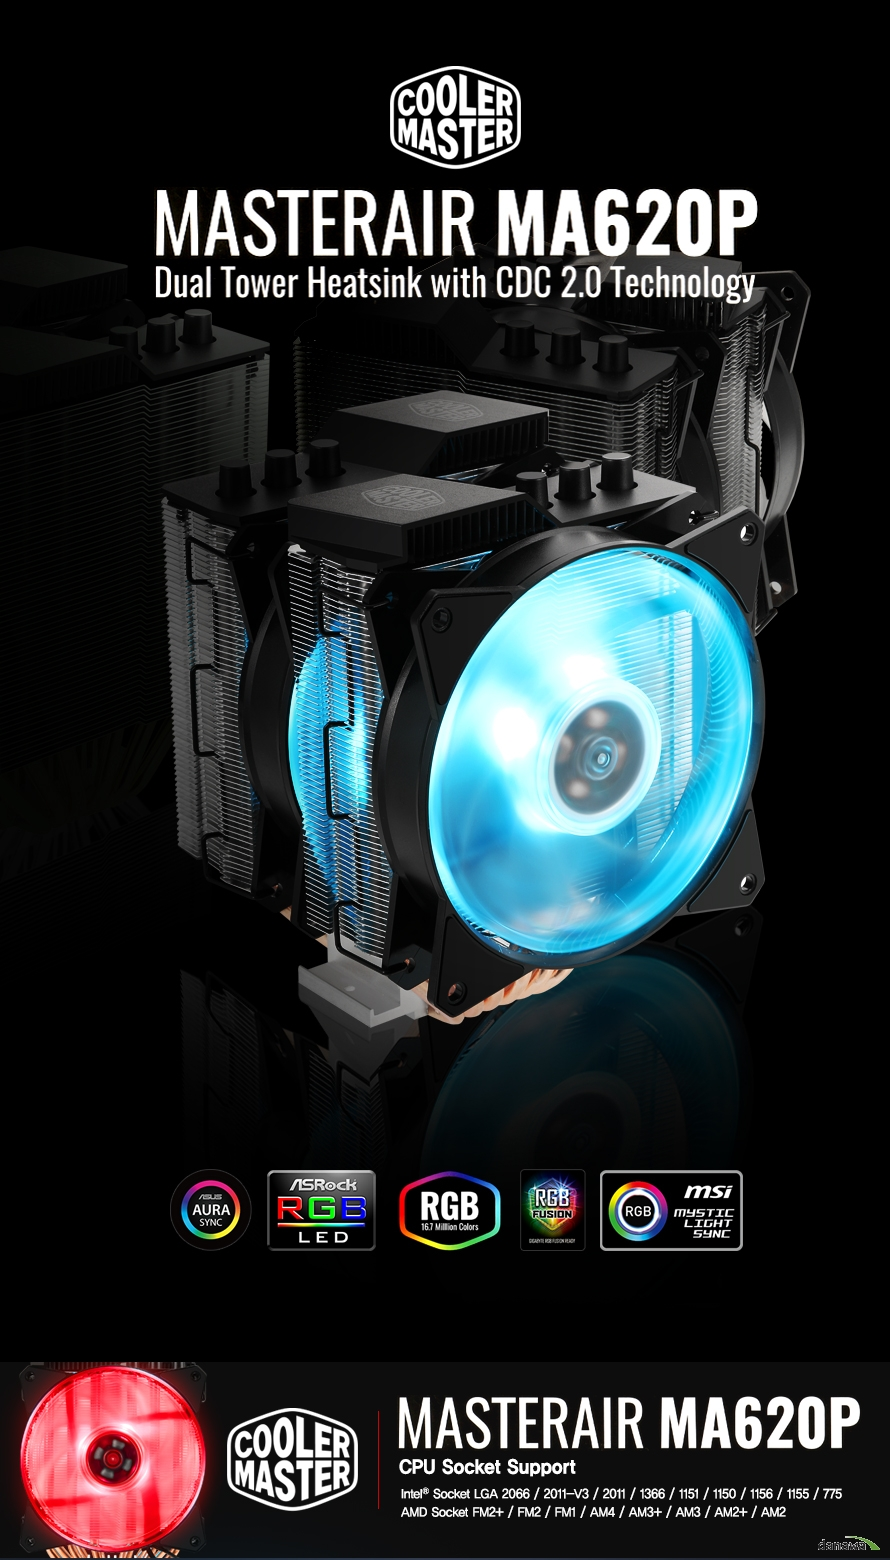 COOLERMASTER HYPER ma620p rgb컨트롤러HYPER ma620p CPU Socket SupportIntel Socket LGA 2066 2011-v3 2011 1366 1151 1150 1155 775AMD Socket FM2+ / FM2 / FM1 / AM4  AM3+ / AM3 / AM2+  AM2